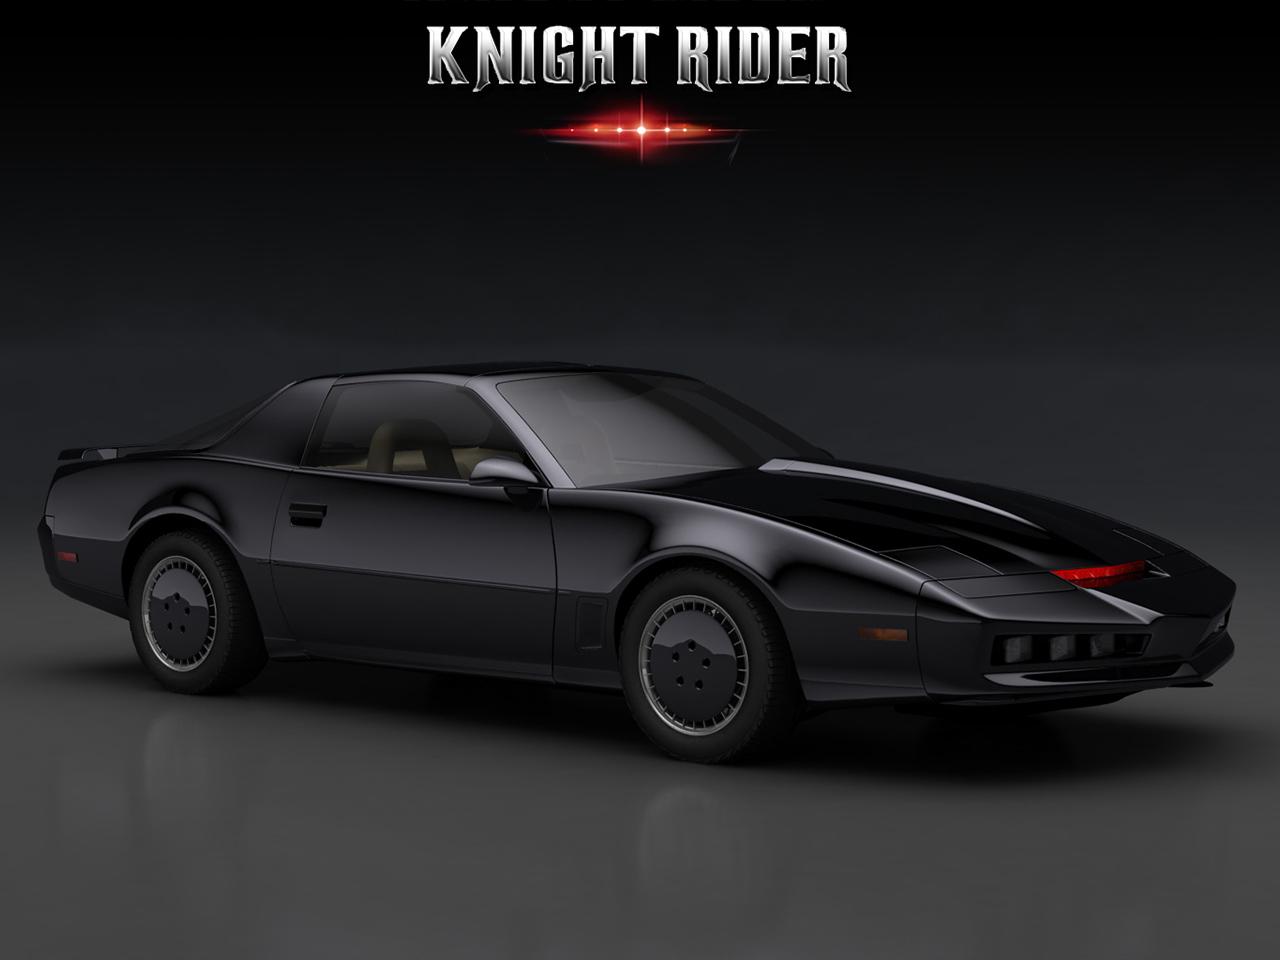 Knightrider 3d fucks clip